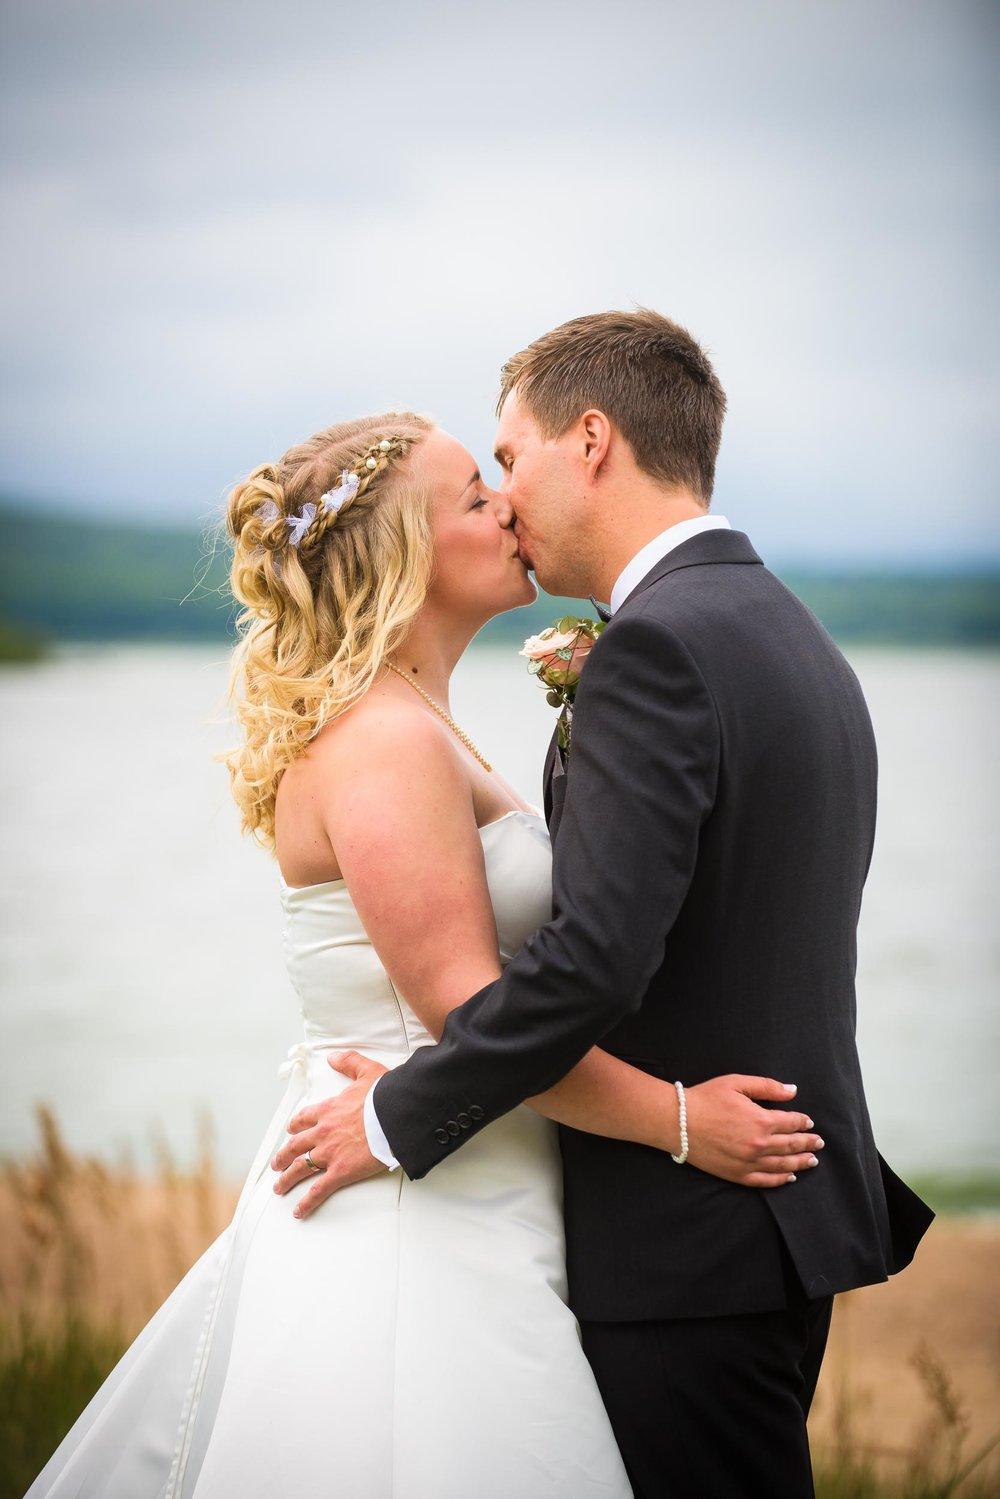 bröllopsfoto-tyringe-aug17-4.jpg